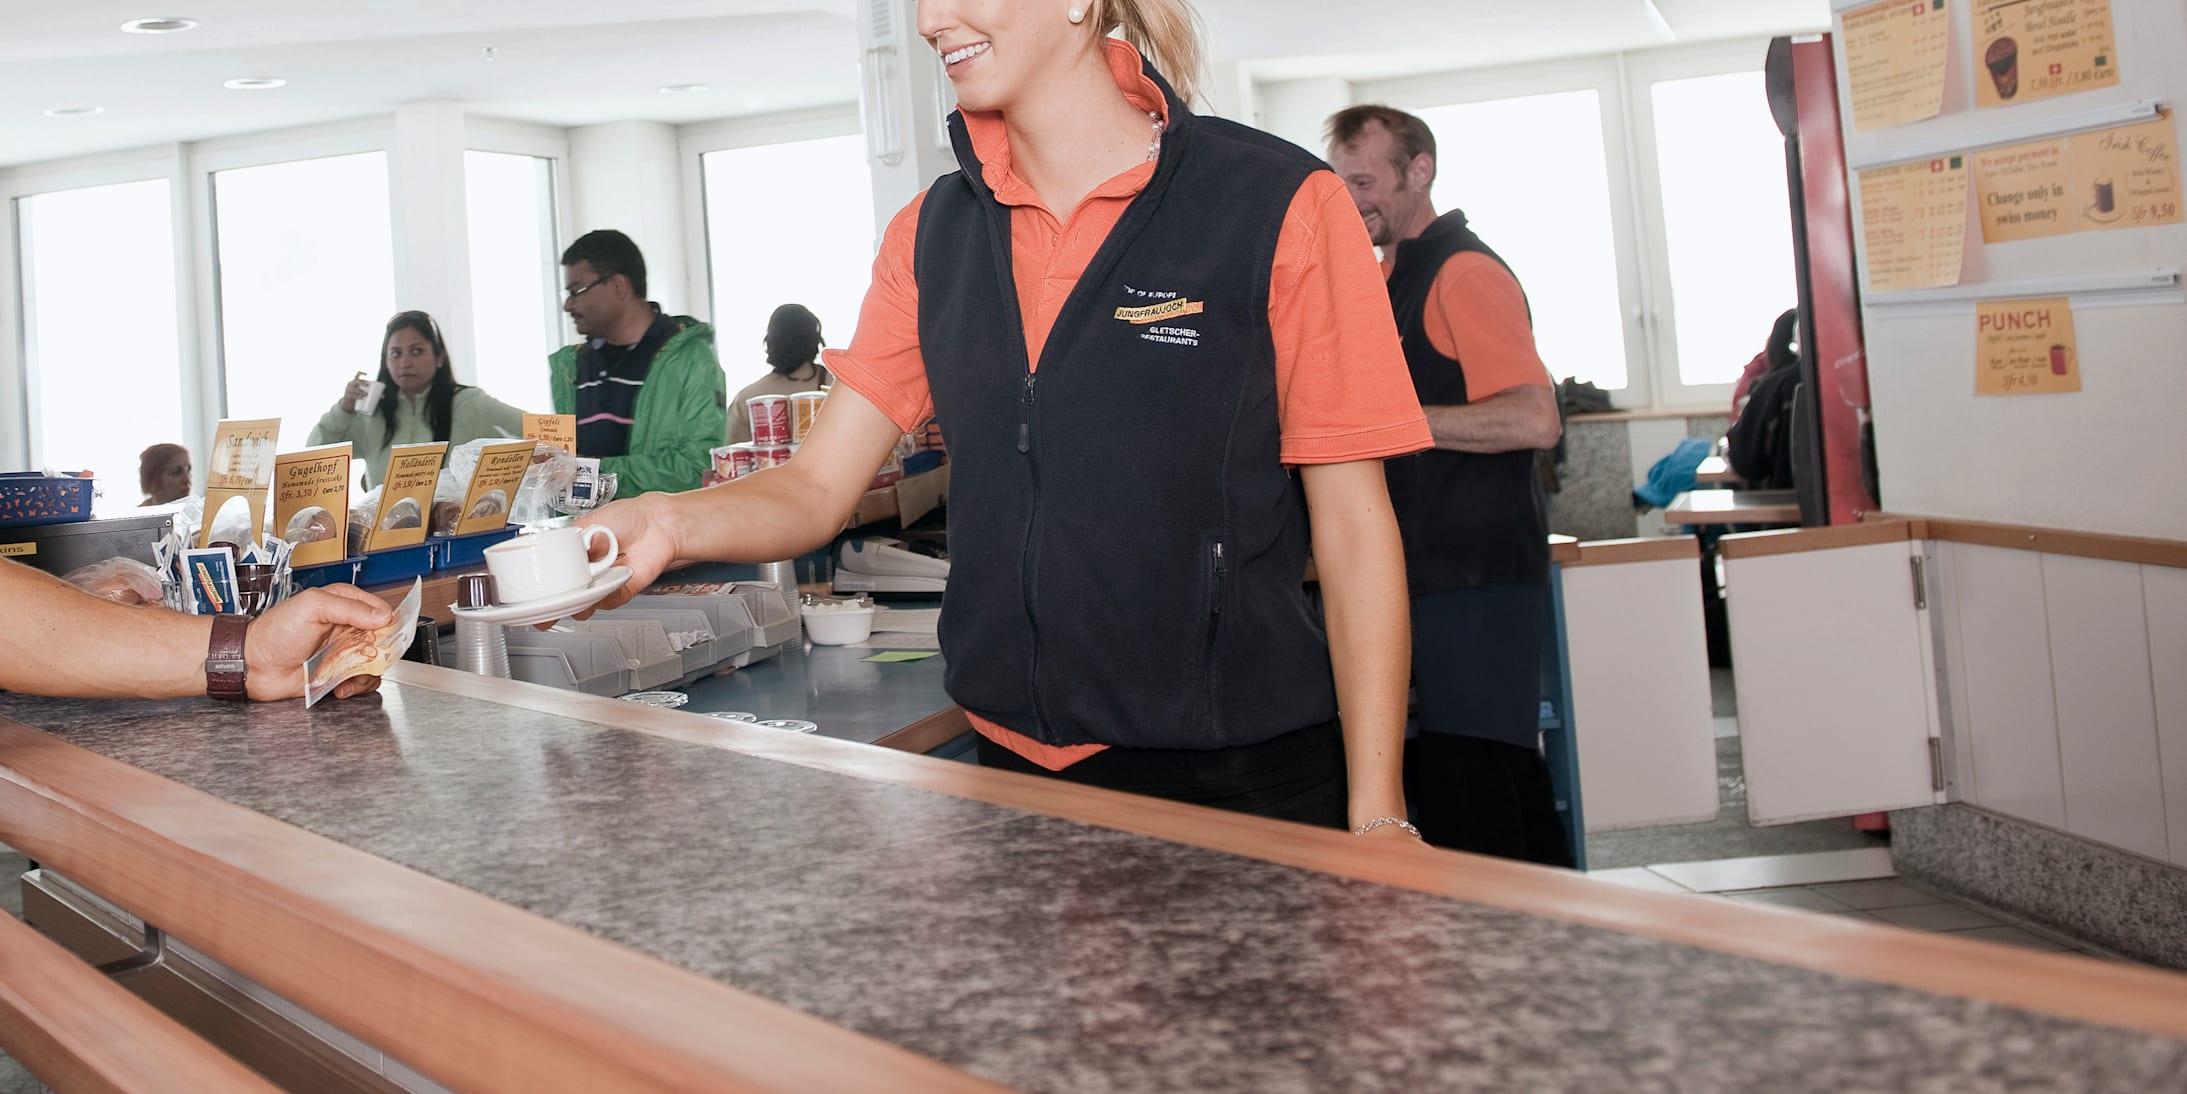 Café-Bar, gastro, inside view, season, Jungfraujoch-Top-of-Europe, jungfrau.ch